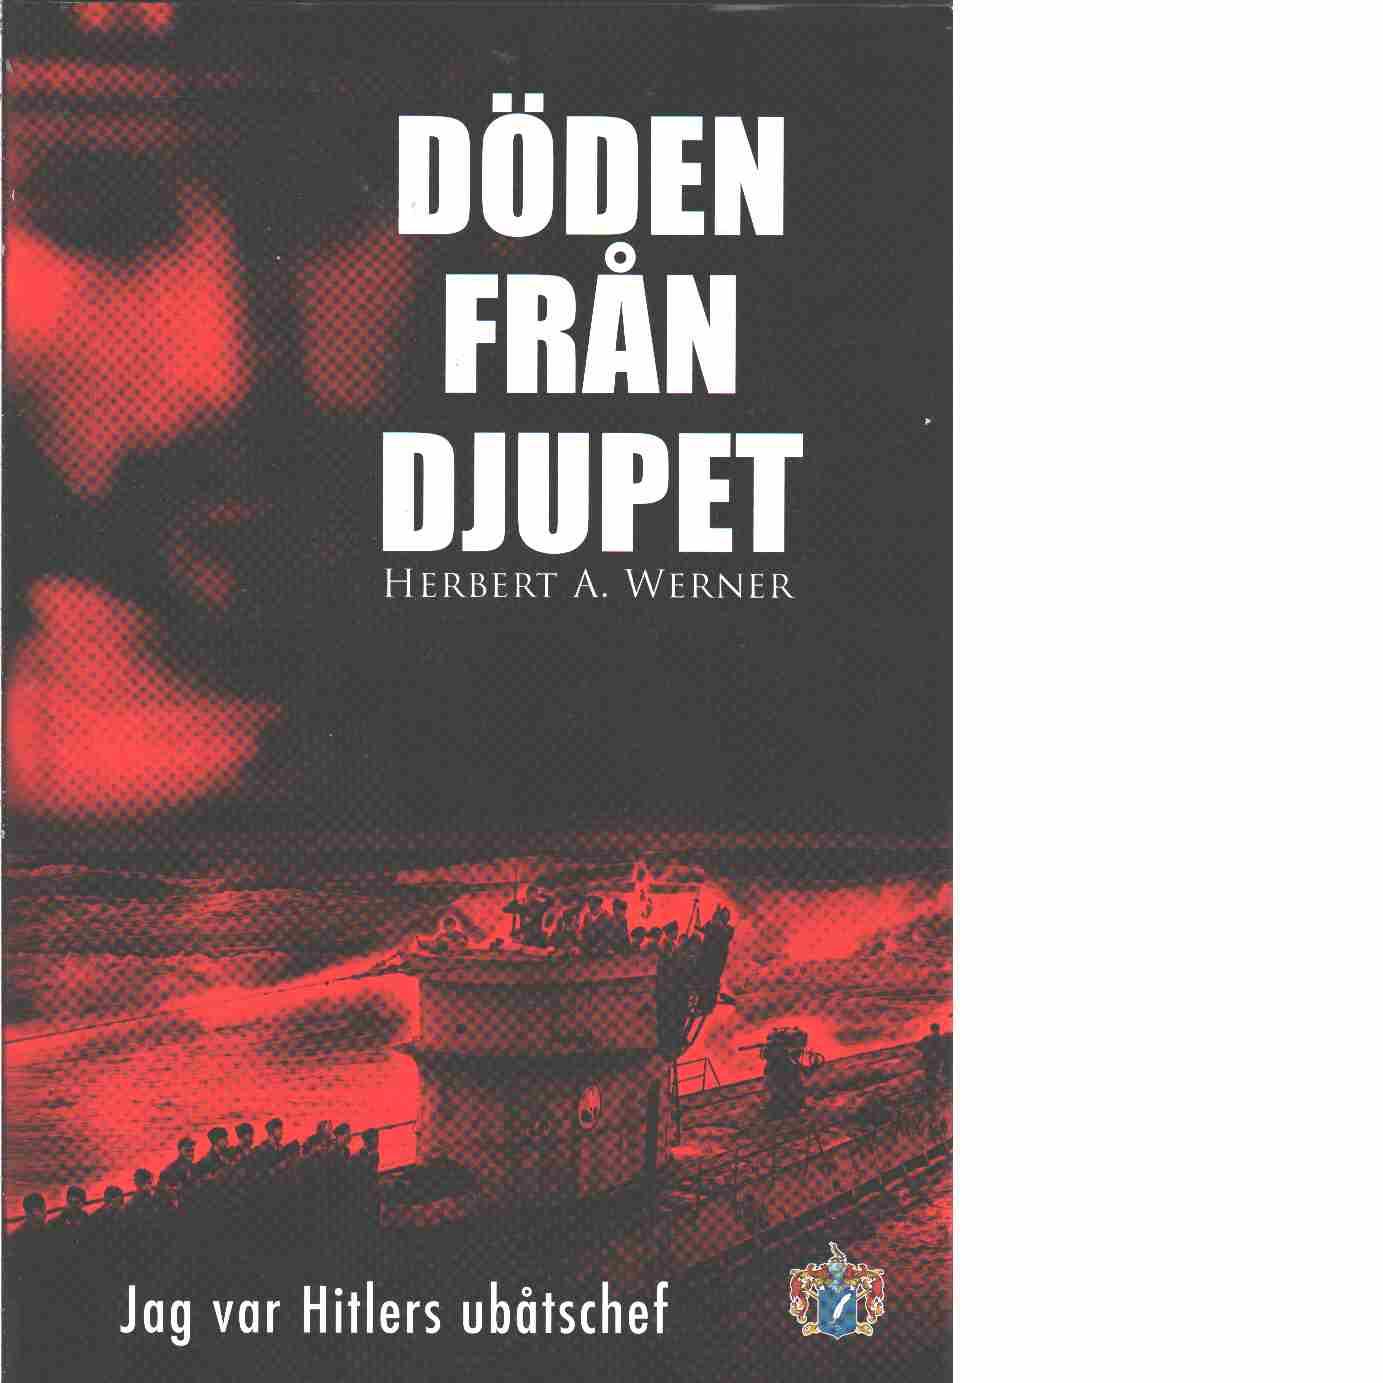 Döden från djupet : jag var Hitlers ubåtschef - Werner, Herbert A.